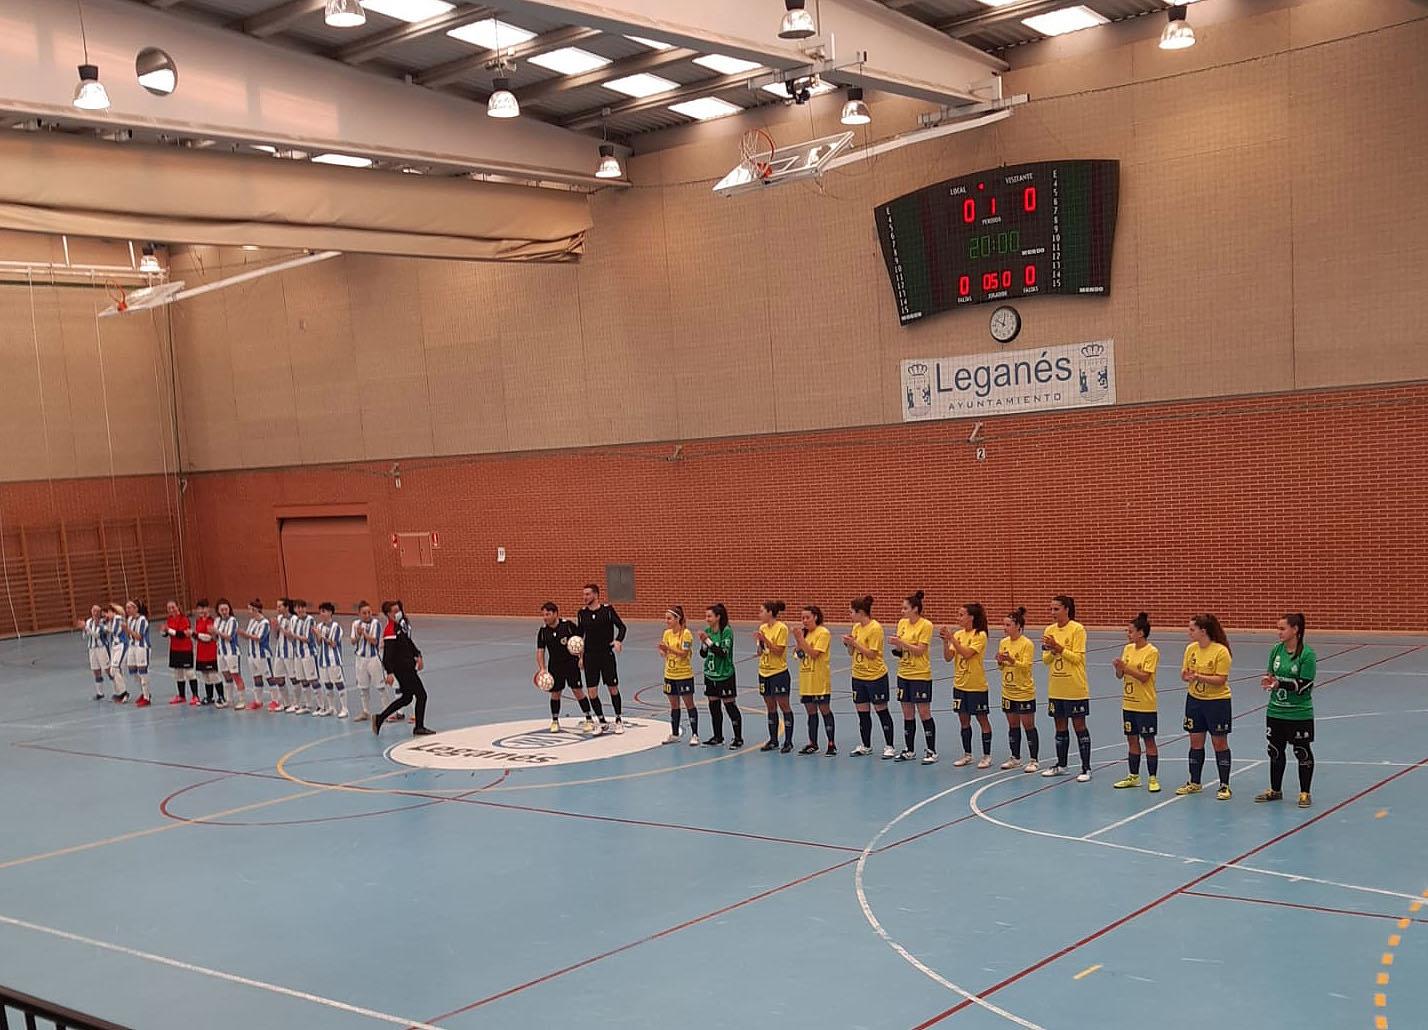 Crónica del Partido: CD Leganés B - Gran Canaria Teldeportivo B